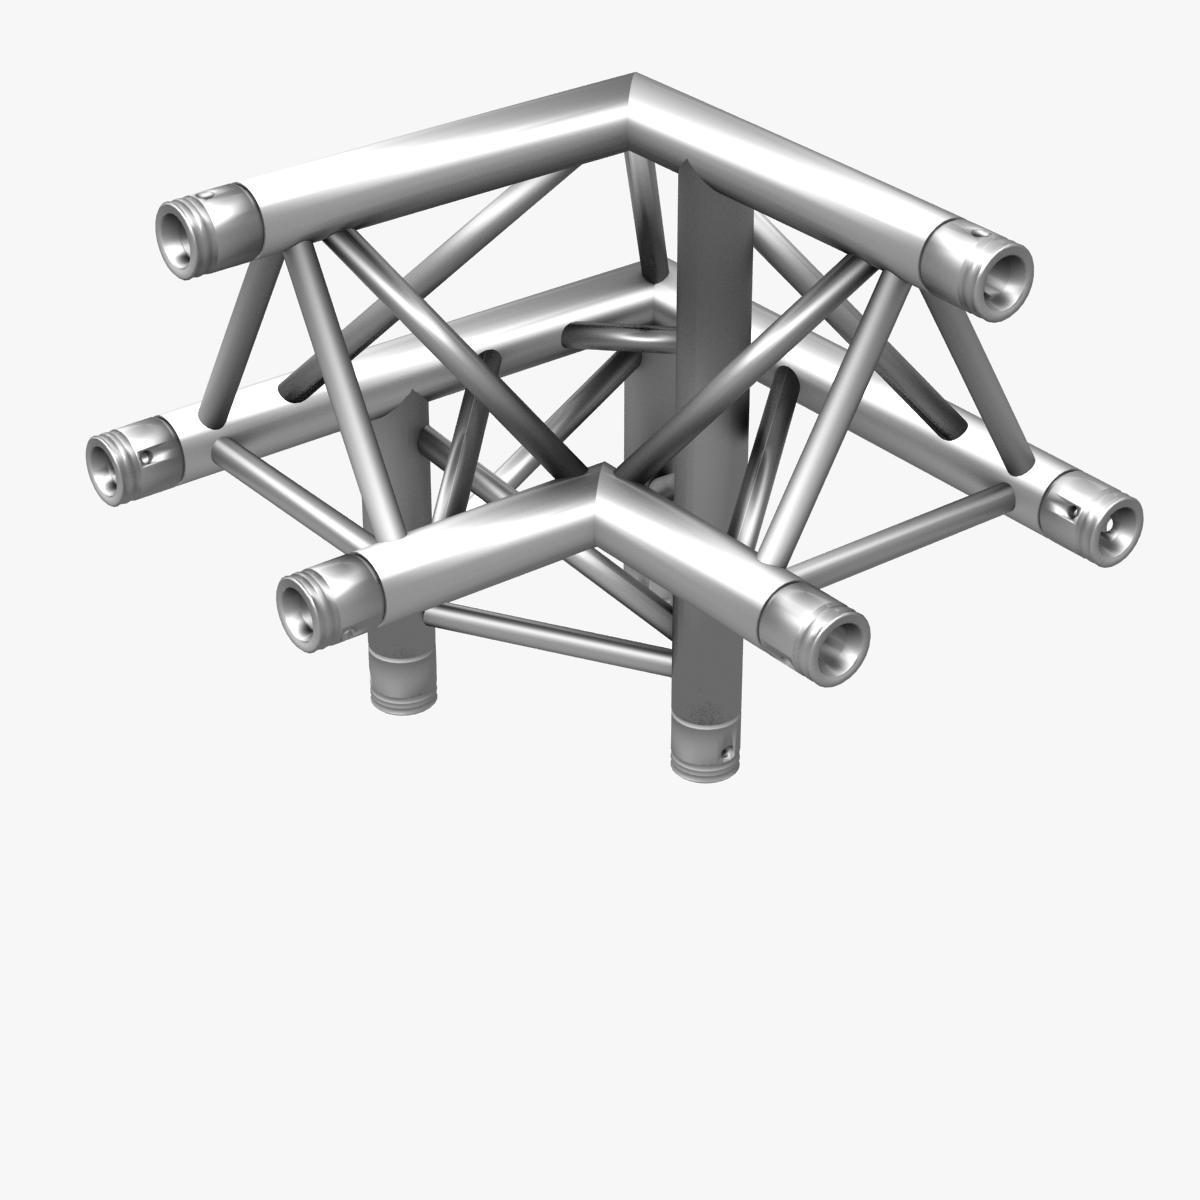 triangular trusses (collection 55 modular pieces) 3d model 3ds max dxf fbx c4d dae texture obj 216238